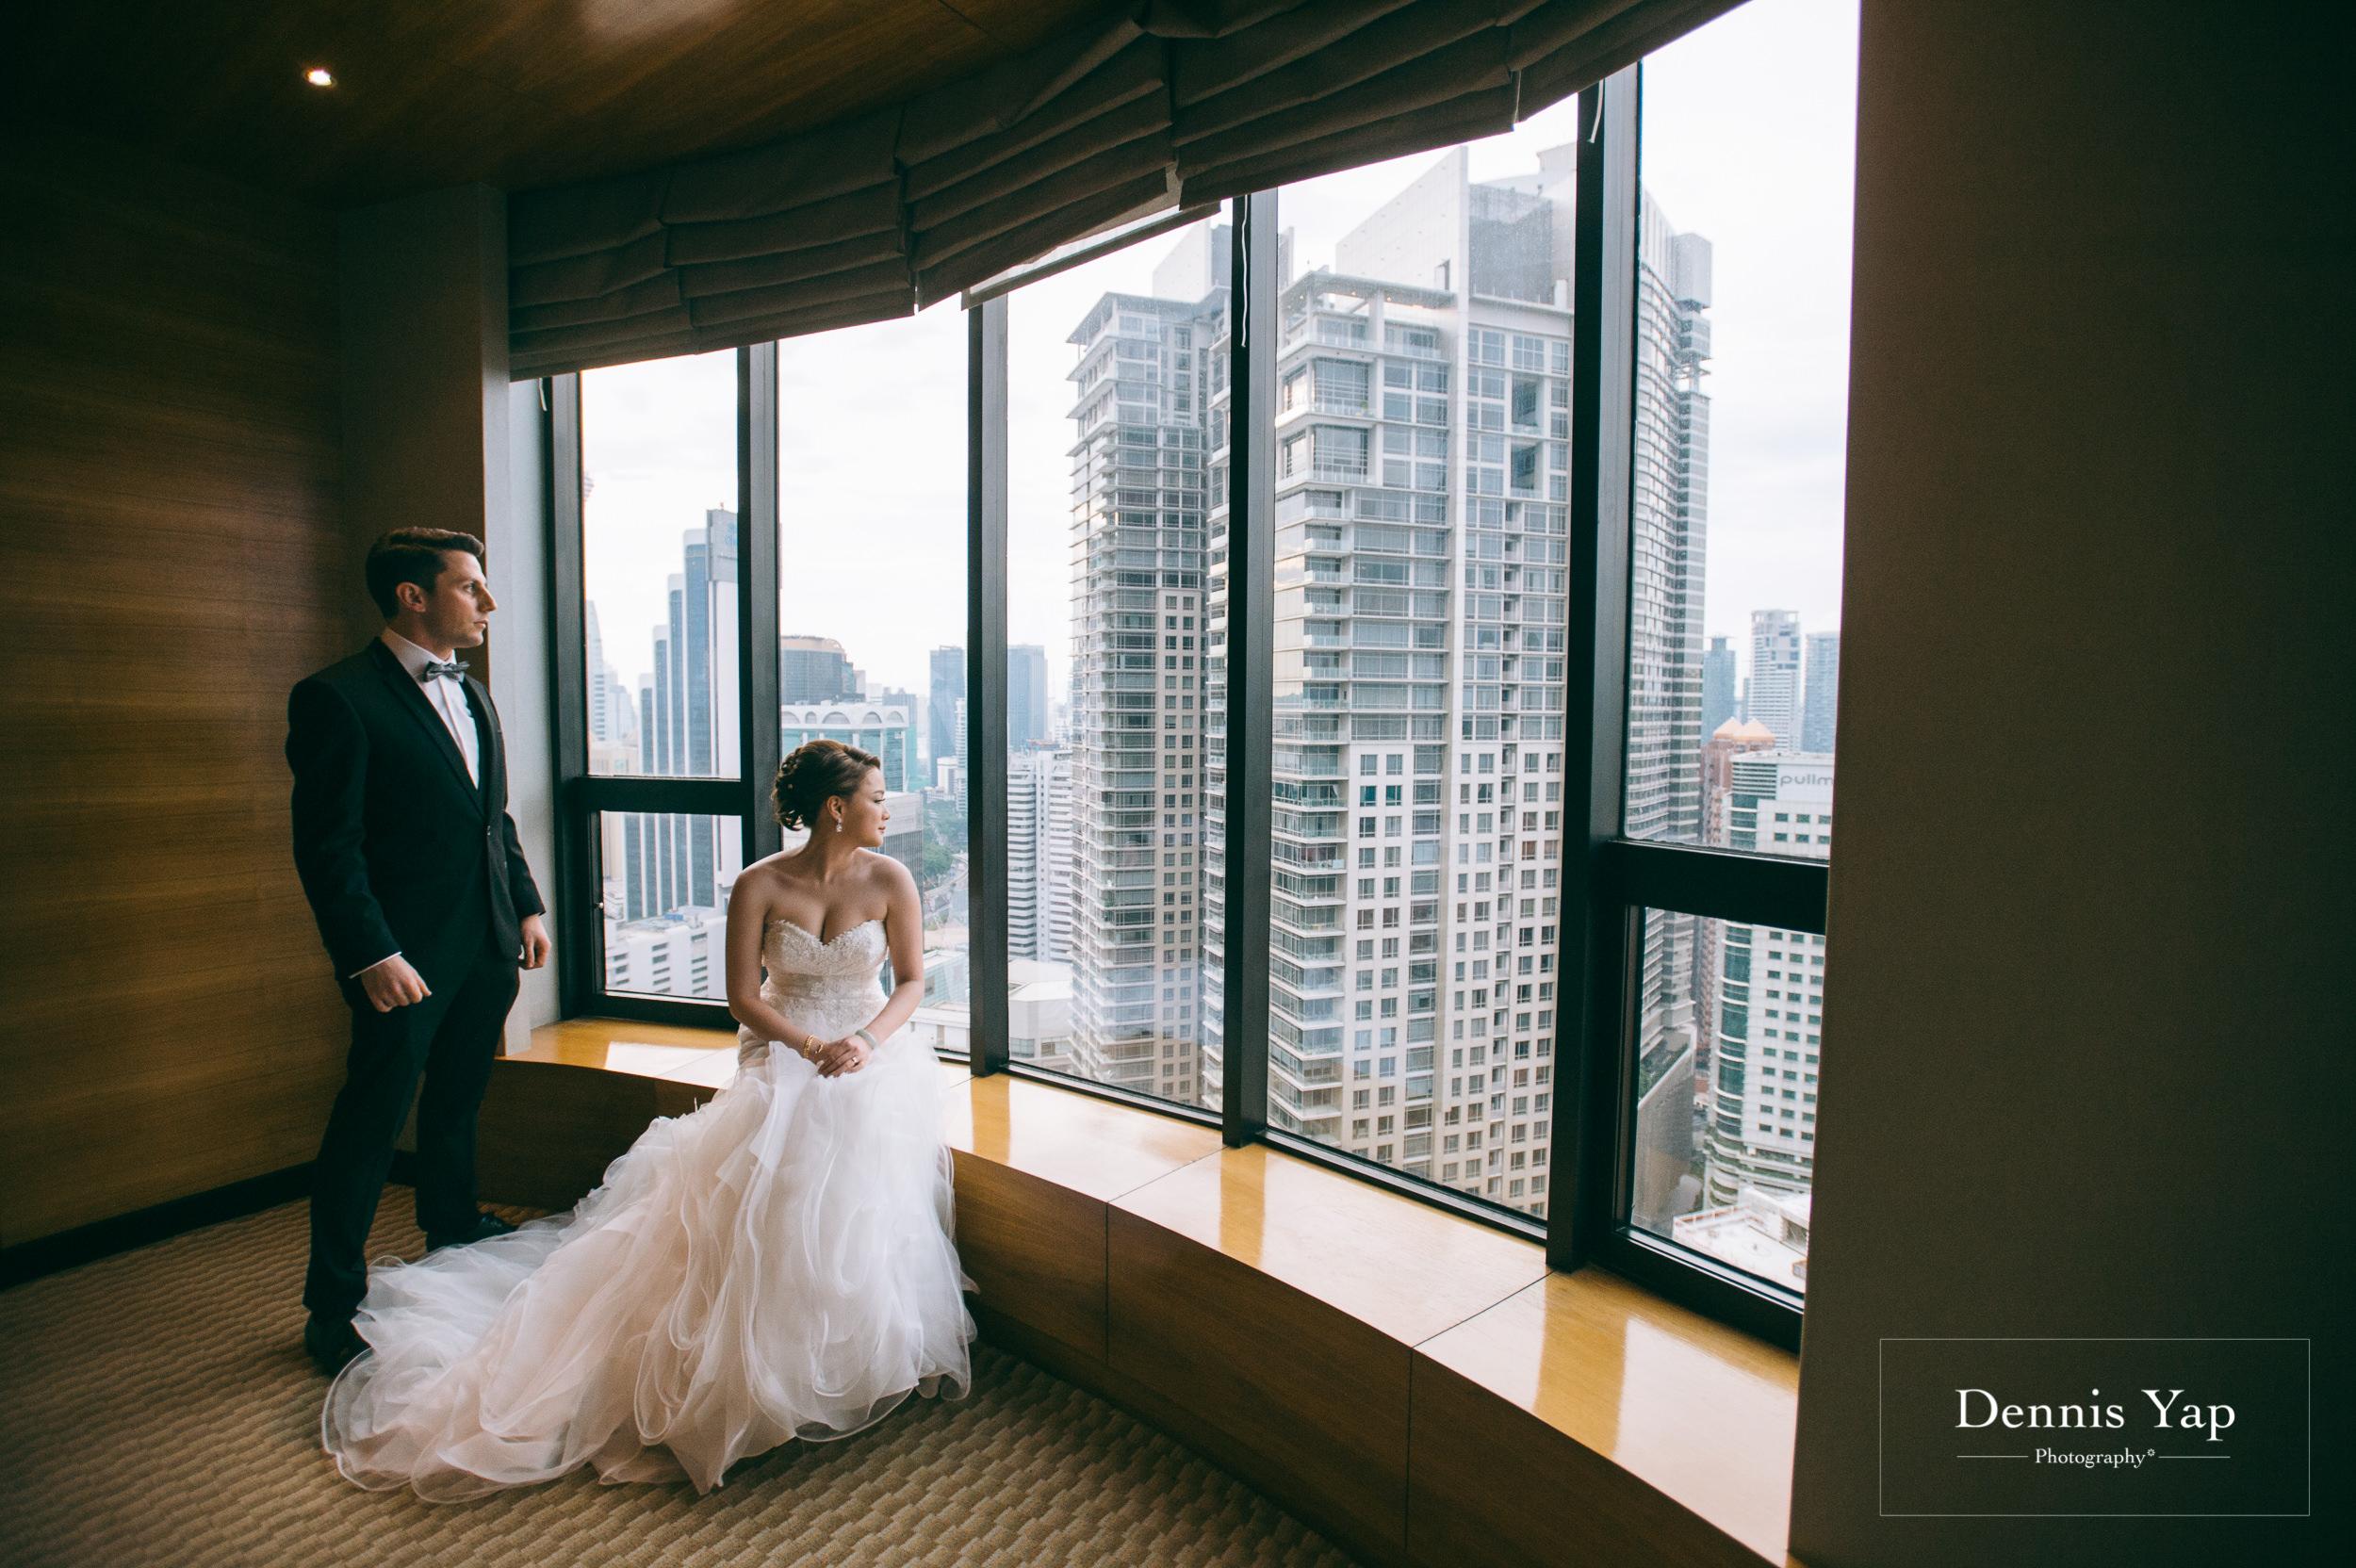 jordan amanda wedding day westin hotel kuala lumpur choe family dennis yap photography-21.jpg